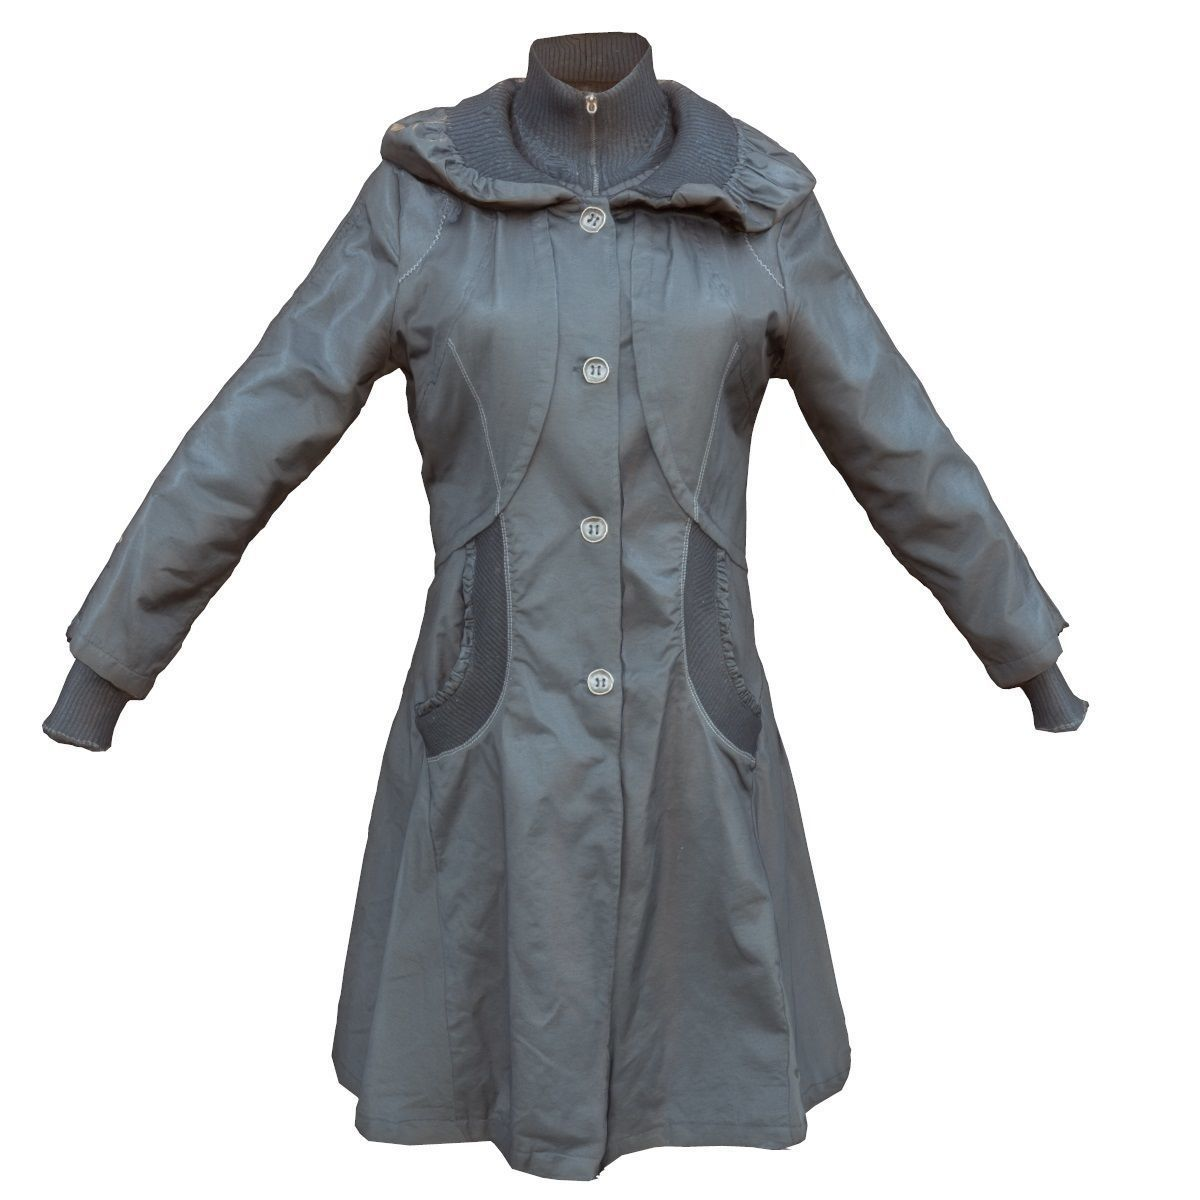 Reputable Black Womans Coat Model Obj Fbx Black Womans Coat Model Cgtrader Black Lab Coats Canada Black Lab Coat Hook bark post Black Lab Coat